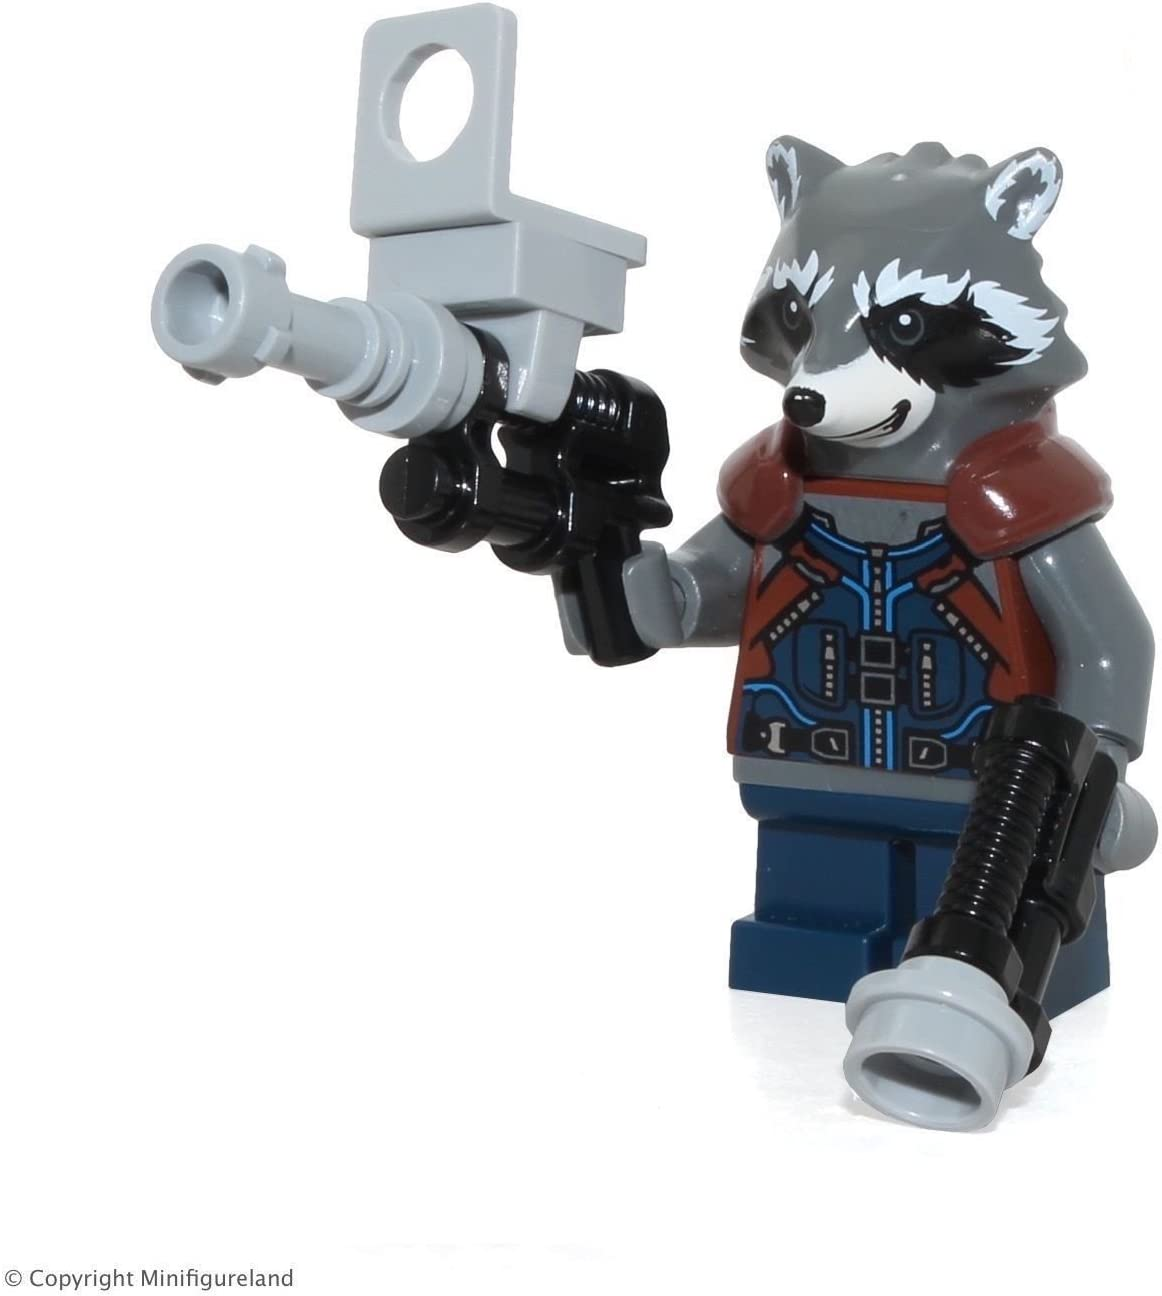 LEGO Super Heroes: Guardians of the Galaxy Vol. 2 MiniFigure - Rocket Raccoon (76079)